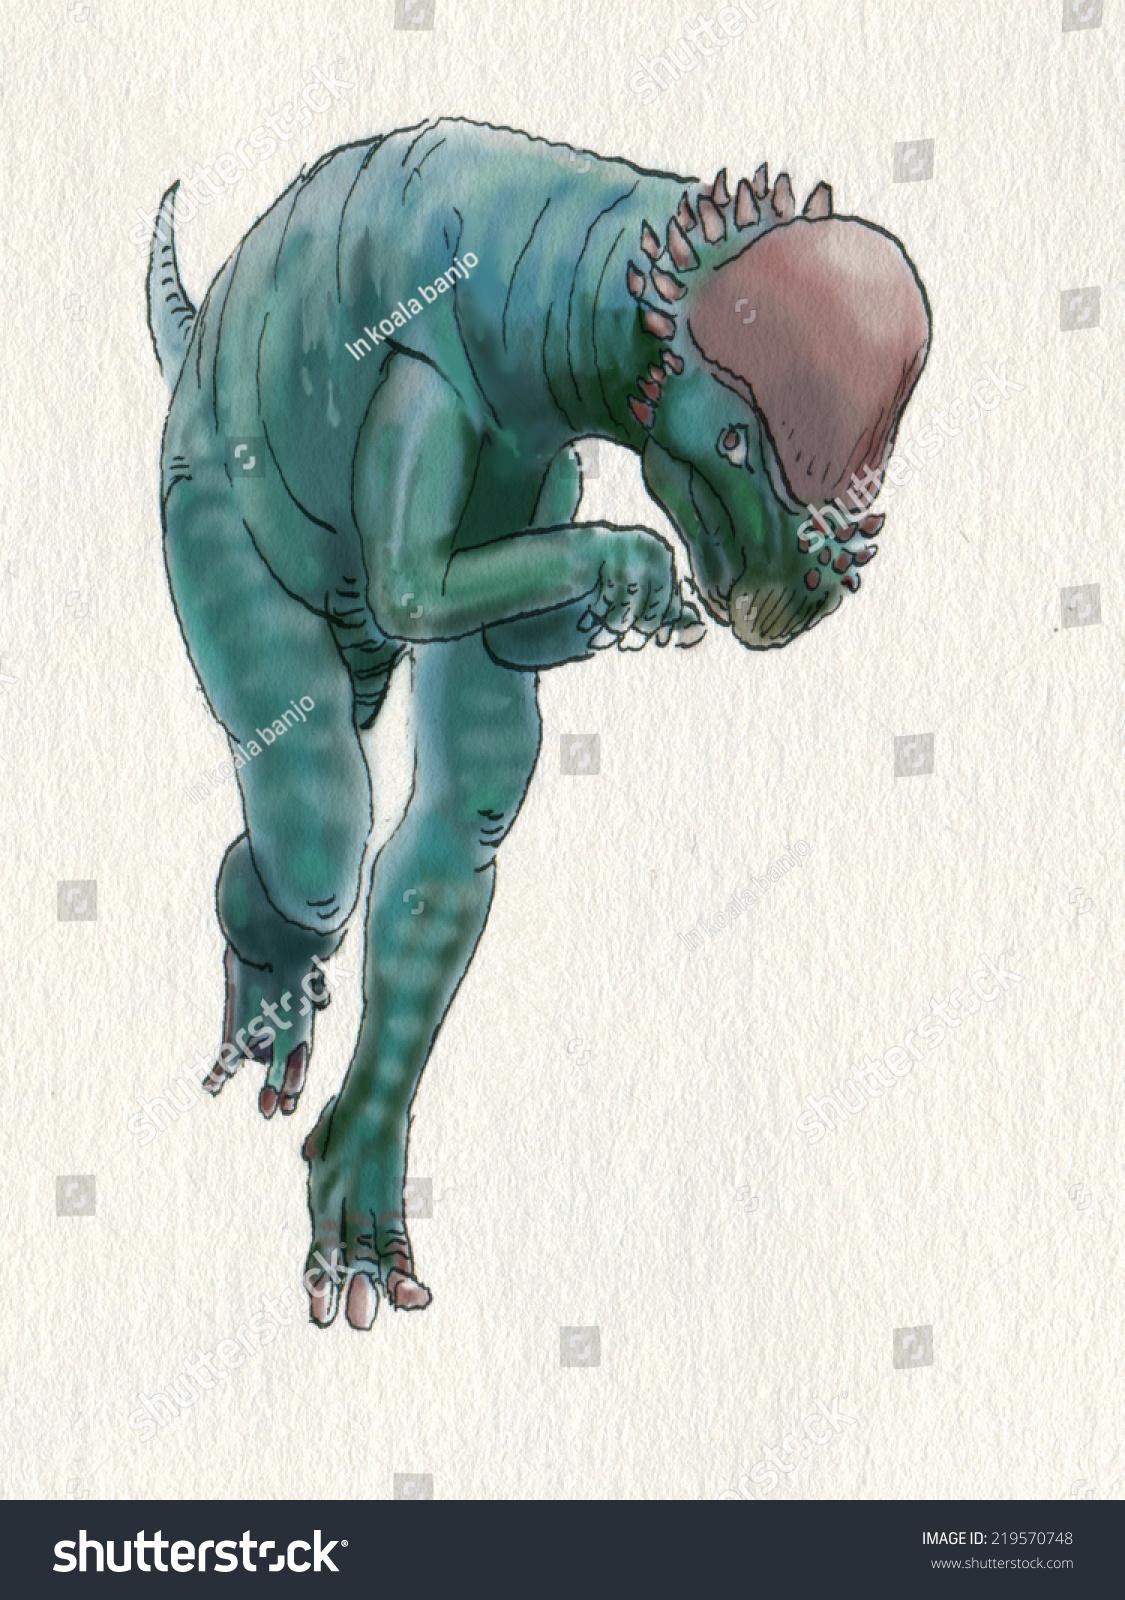 Dinosaur Letter P Artistic Hi Res Drawing Handmade Illustration Of Pachycephalosaurus Greek For